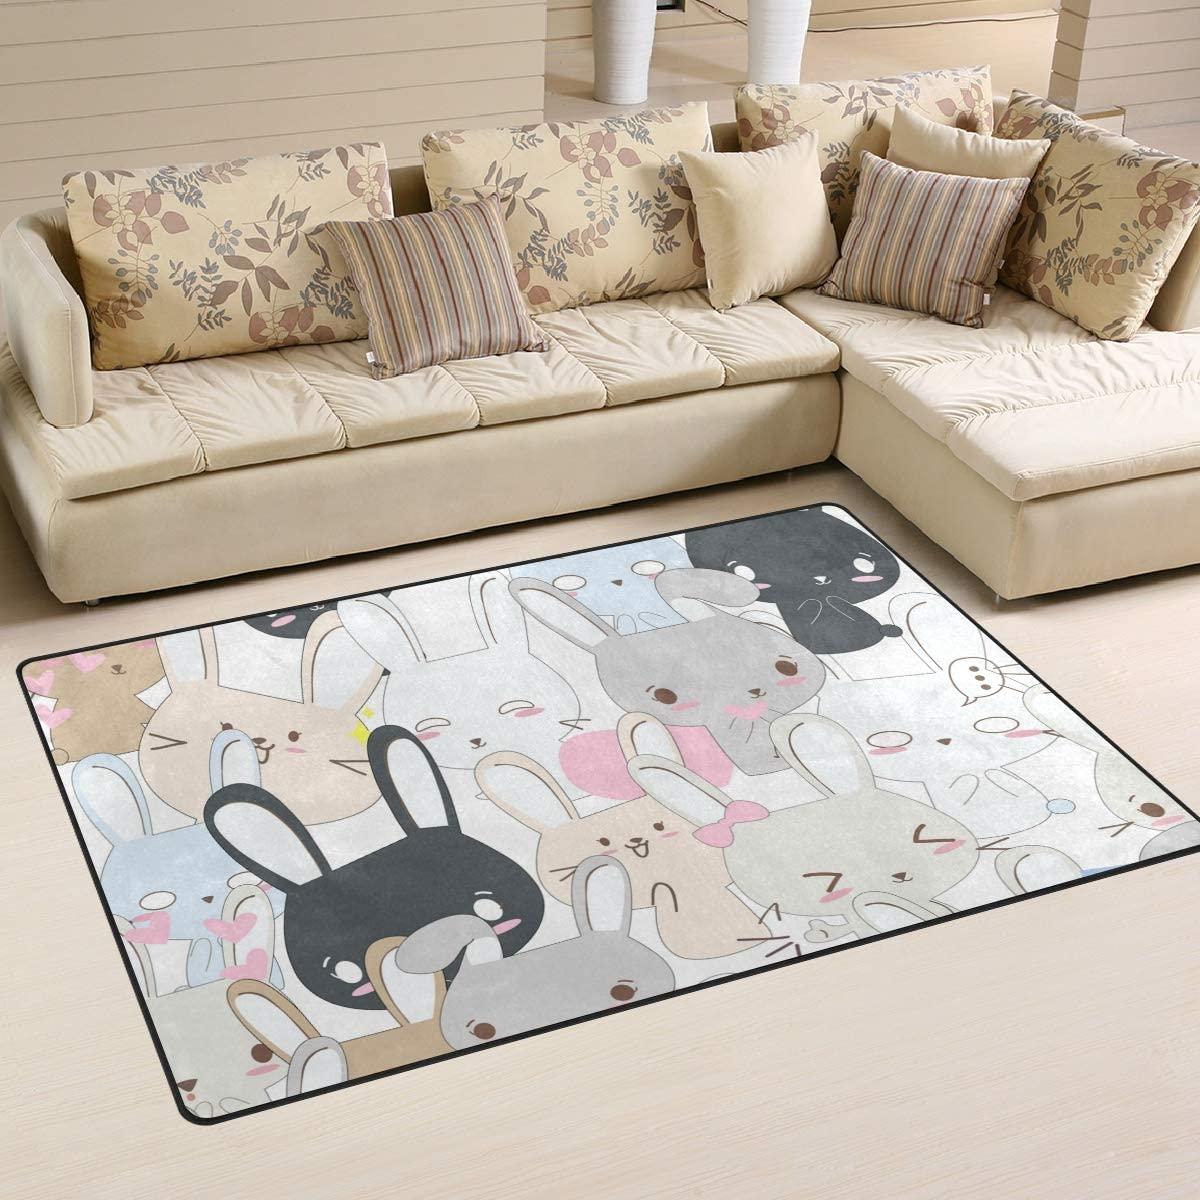 ALAZA Children Area Rug,Lovely Funny Rabbit Bunny Floor Rug Non-Slip Doormat for Living Dining Dorm Room Bedroom Decor 31x20 Inch